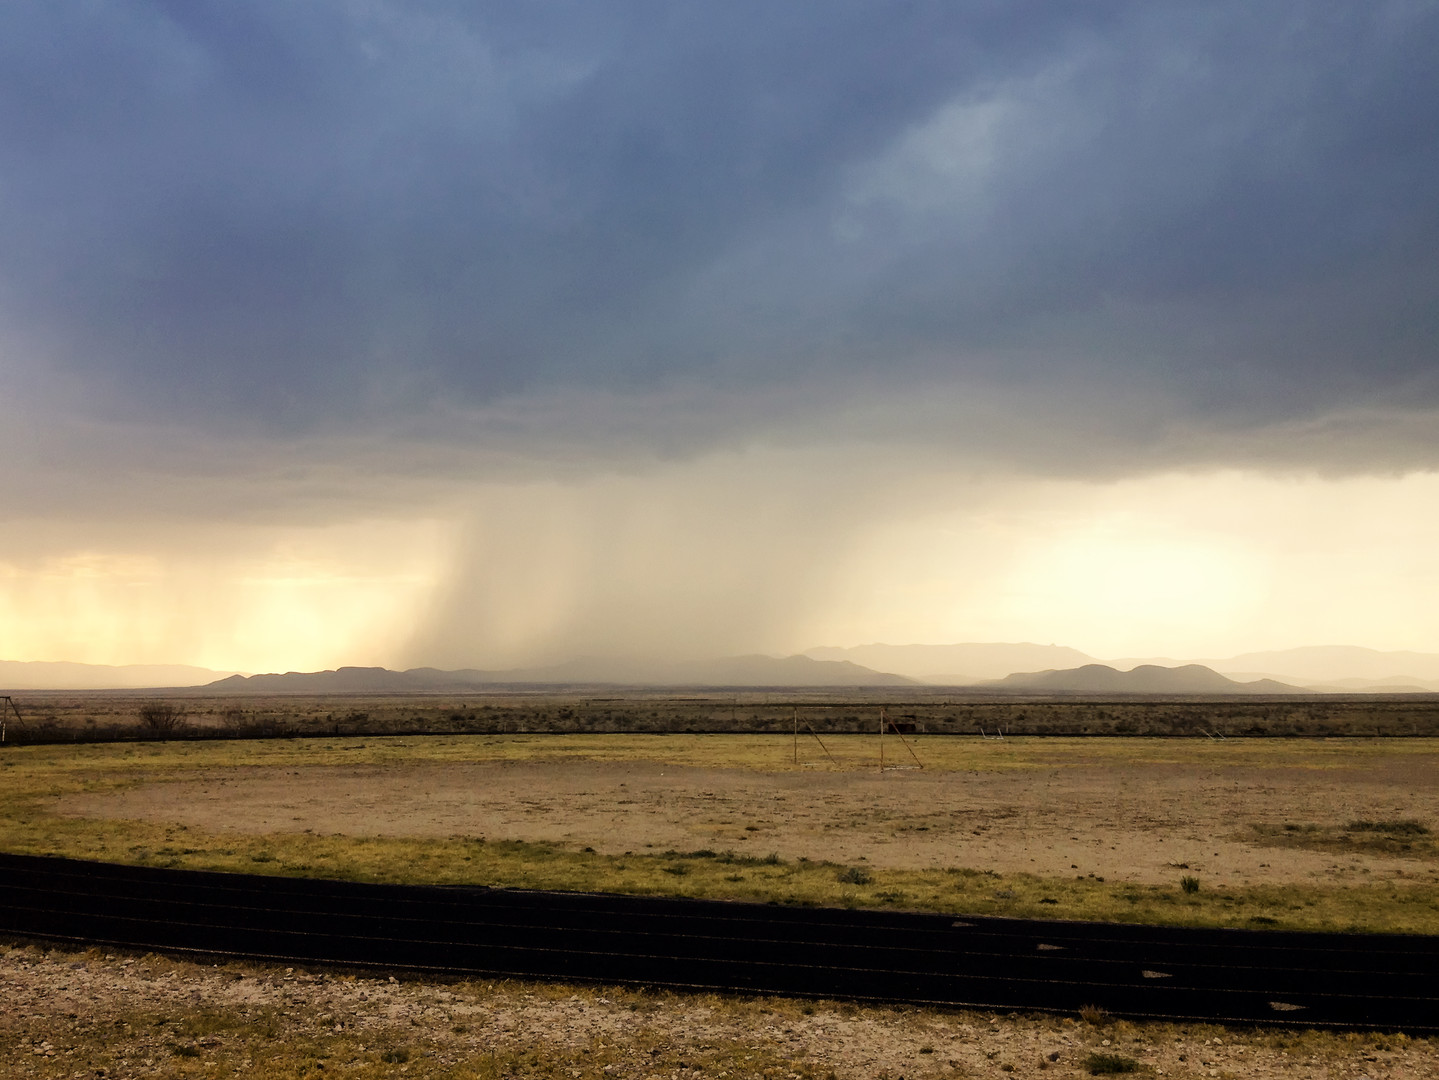 Rain in the Desert - Marathon TX April 2